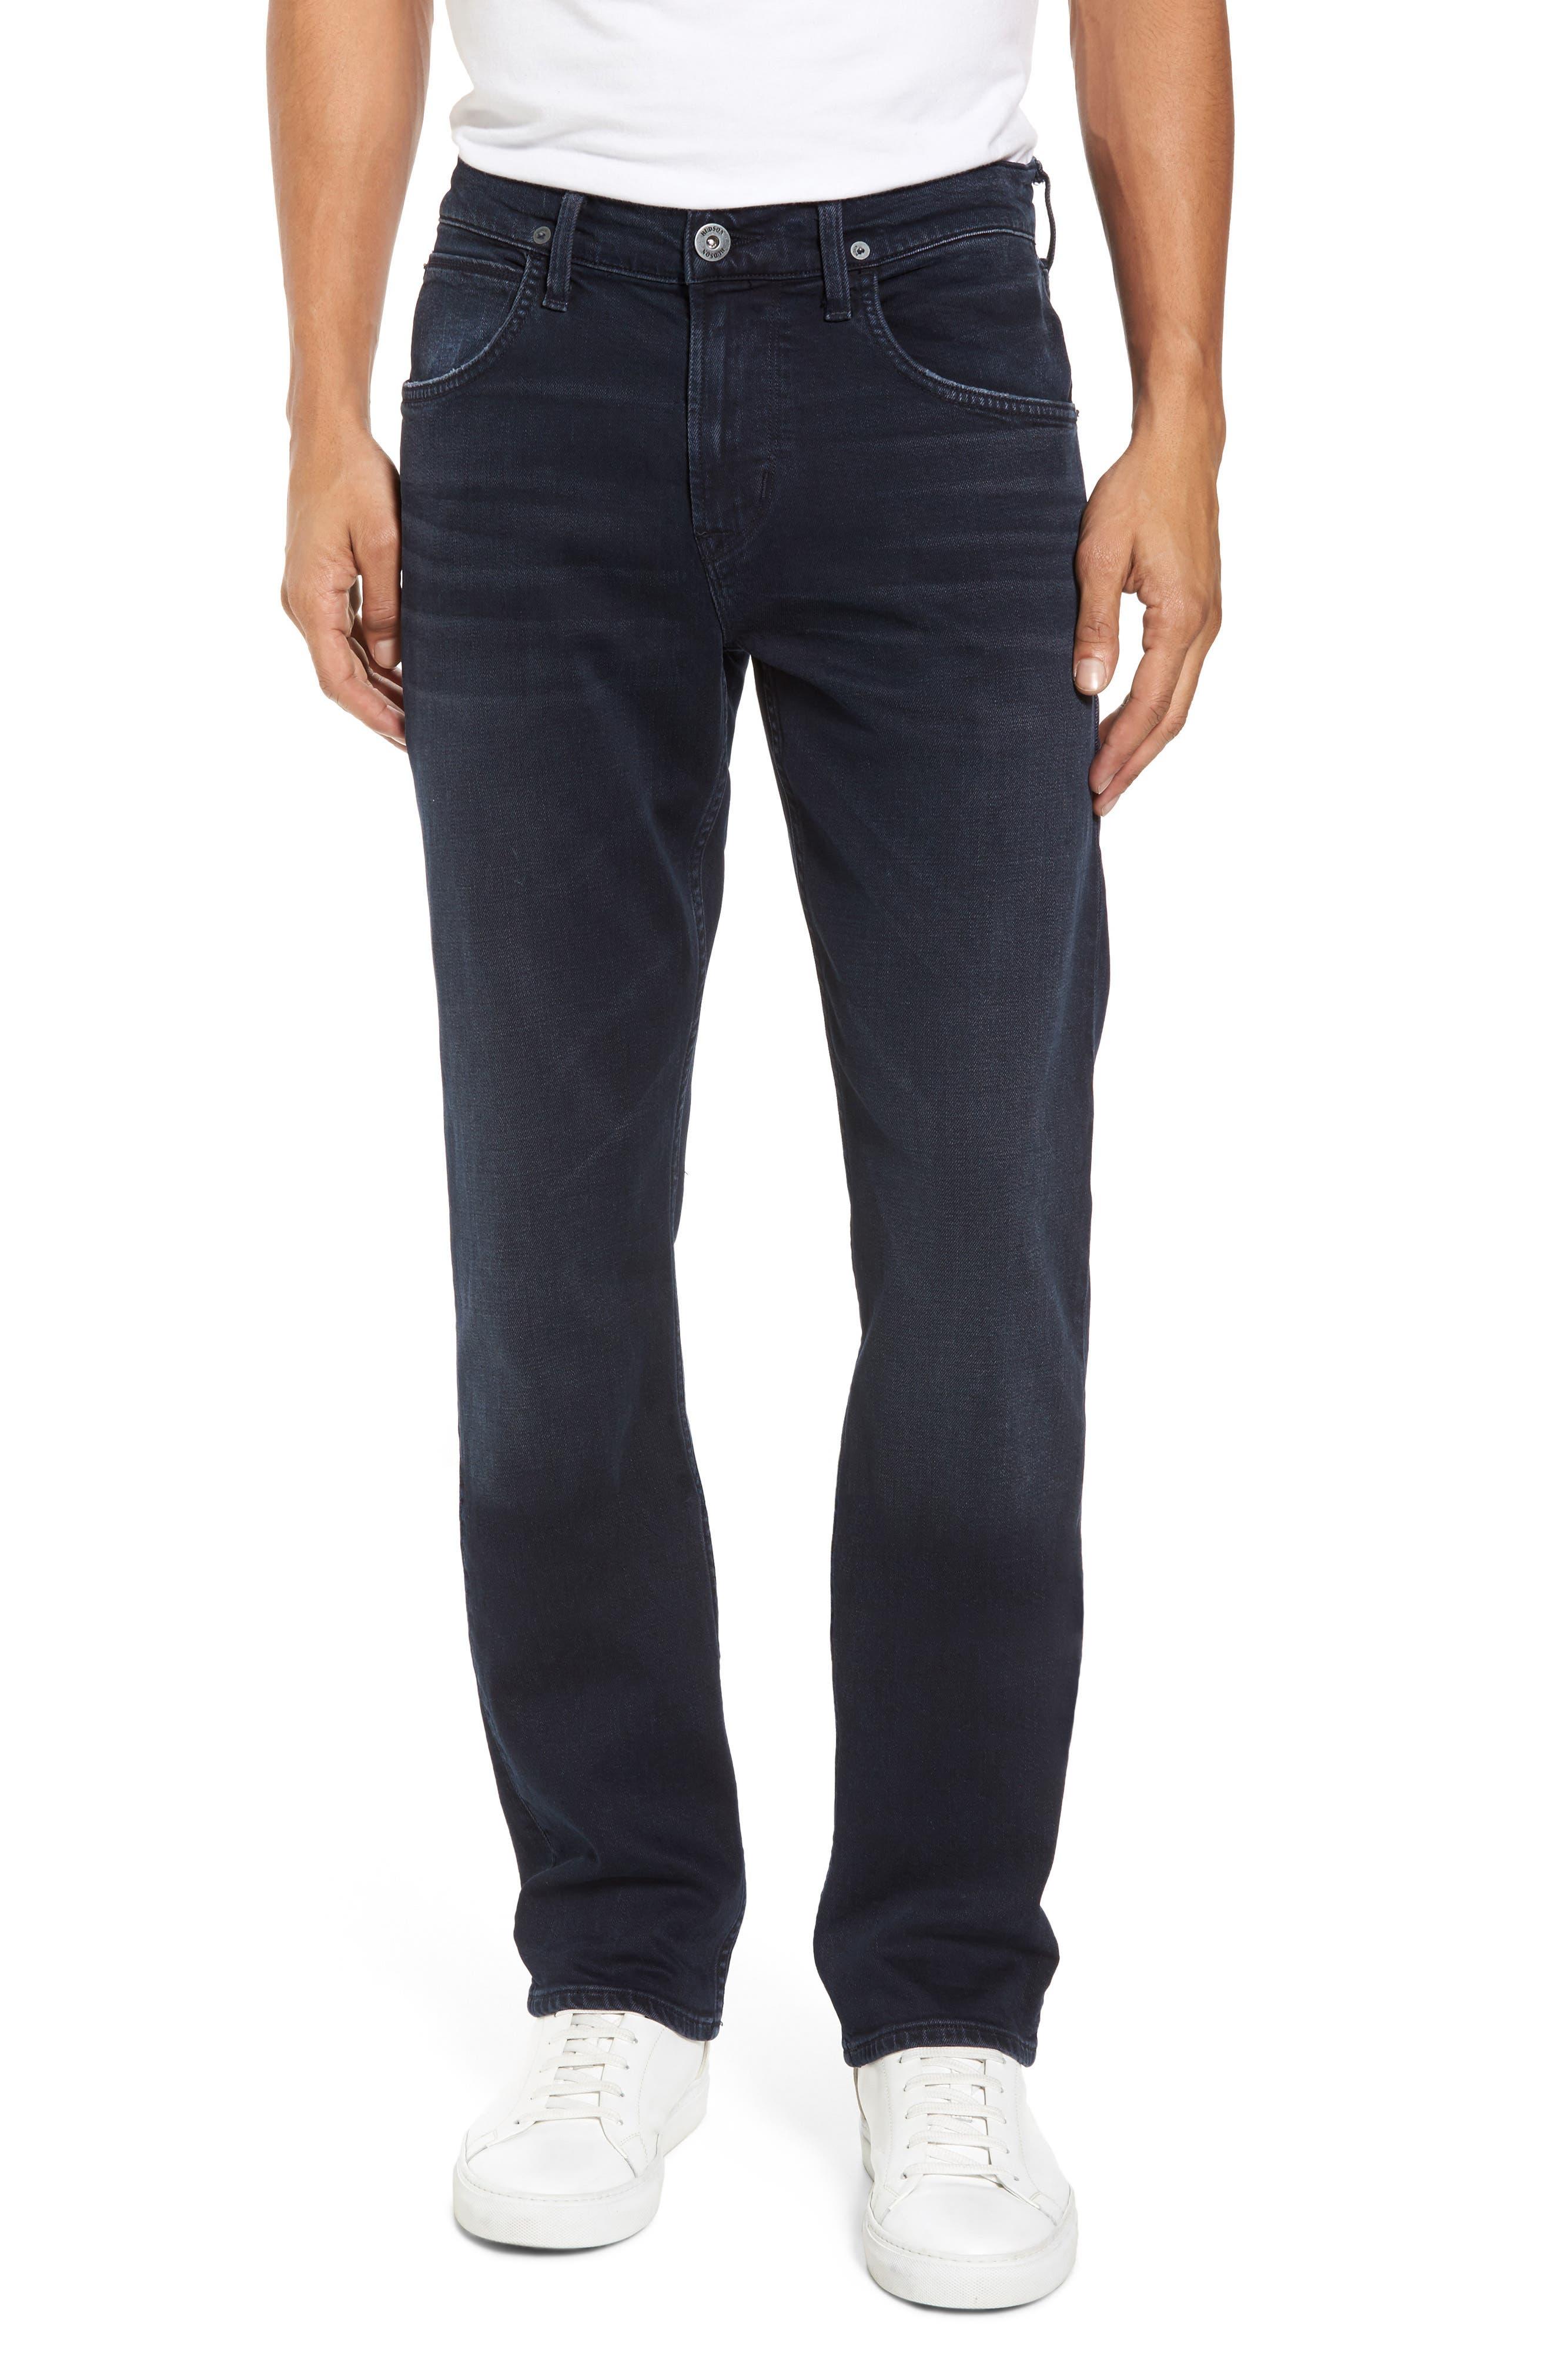 Byron Slim Straight Leg Jeans,                             Main thumbnail 1, color,                             Threaten